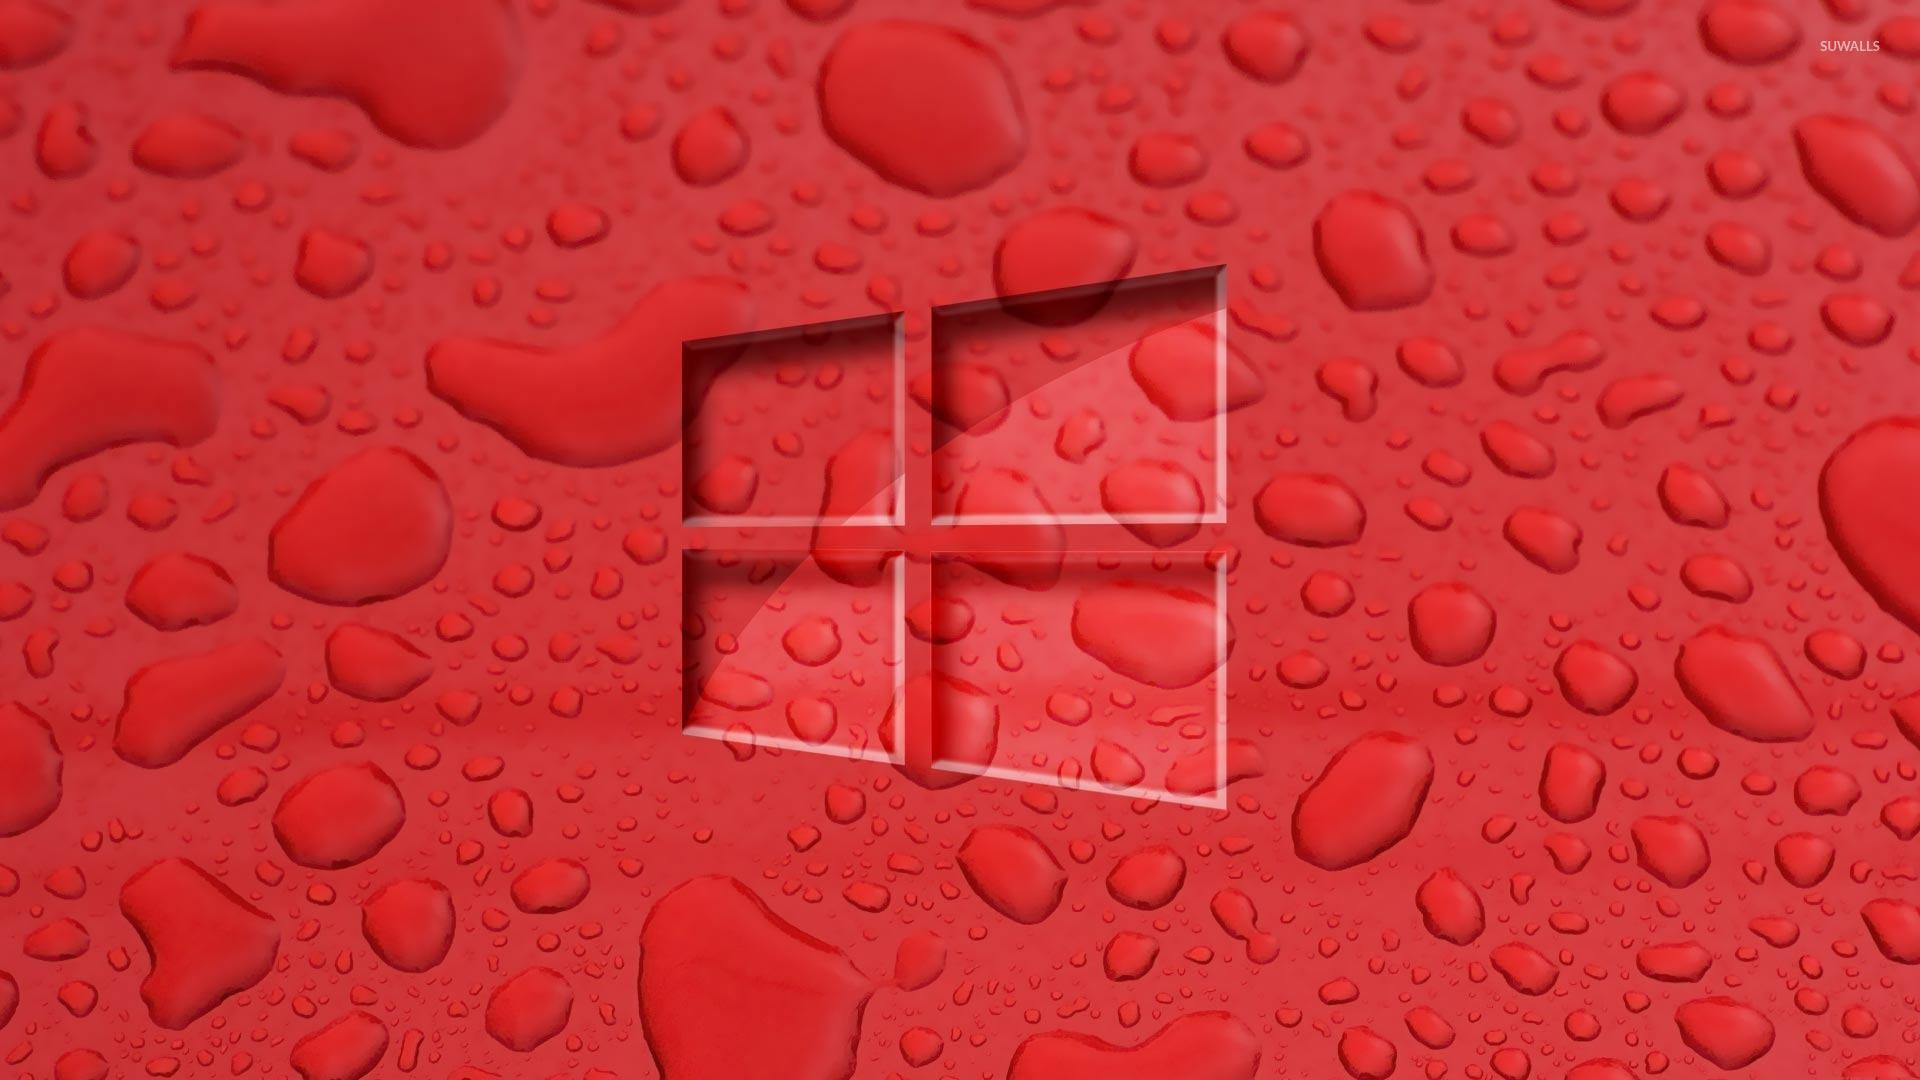 windows 10 wallpaper red supportive guru